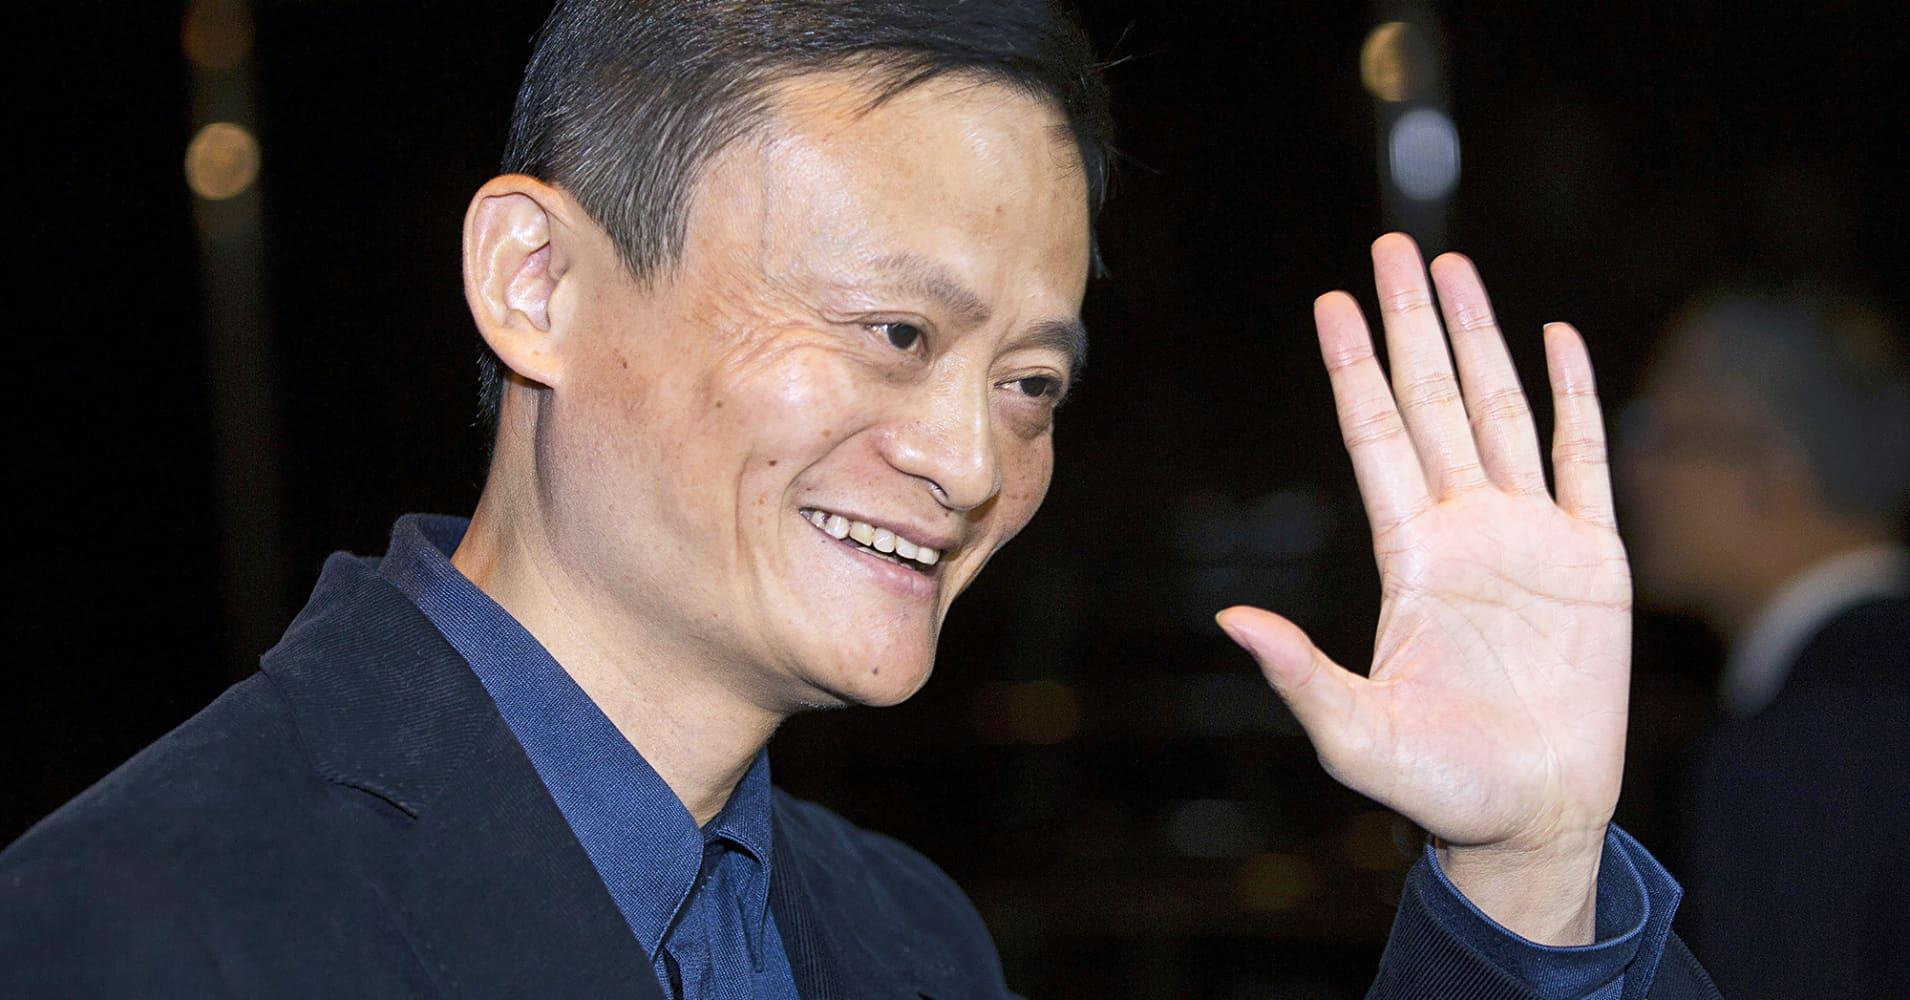 Into the hands of Jack Ma - Alibaba entrepreneur (China) 102010340-jack-ma.1910x1000